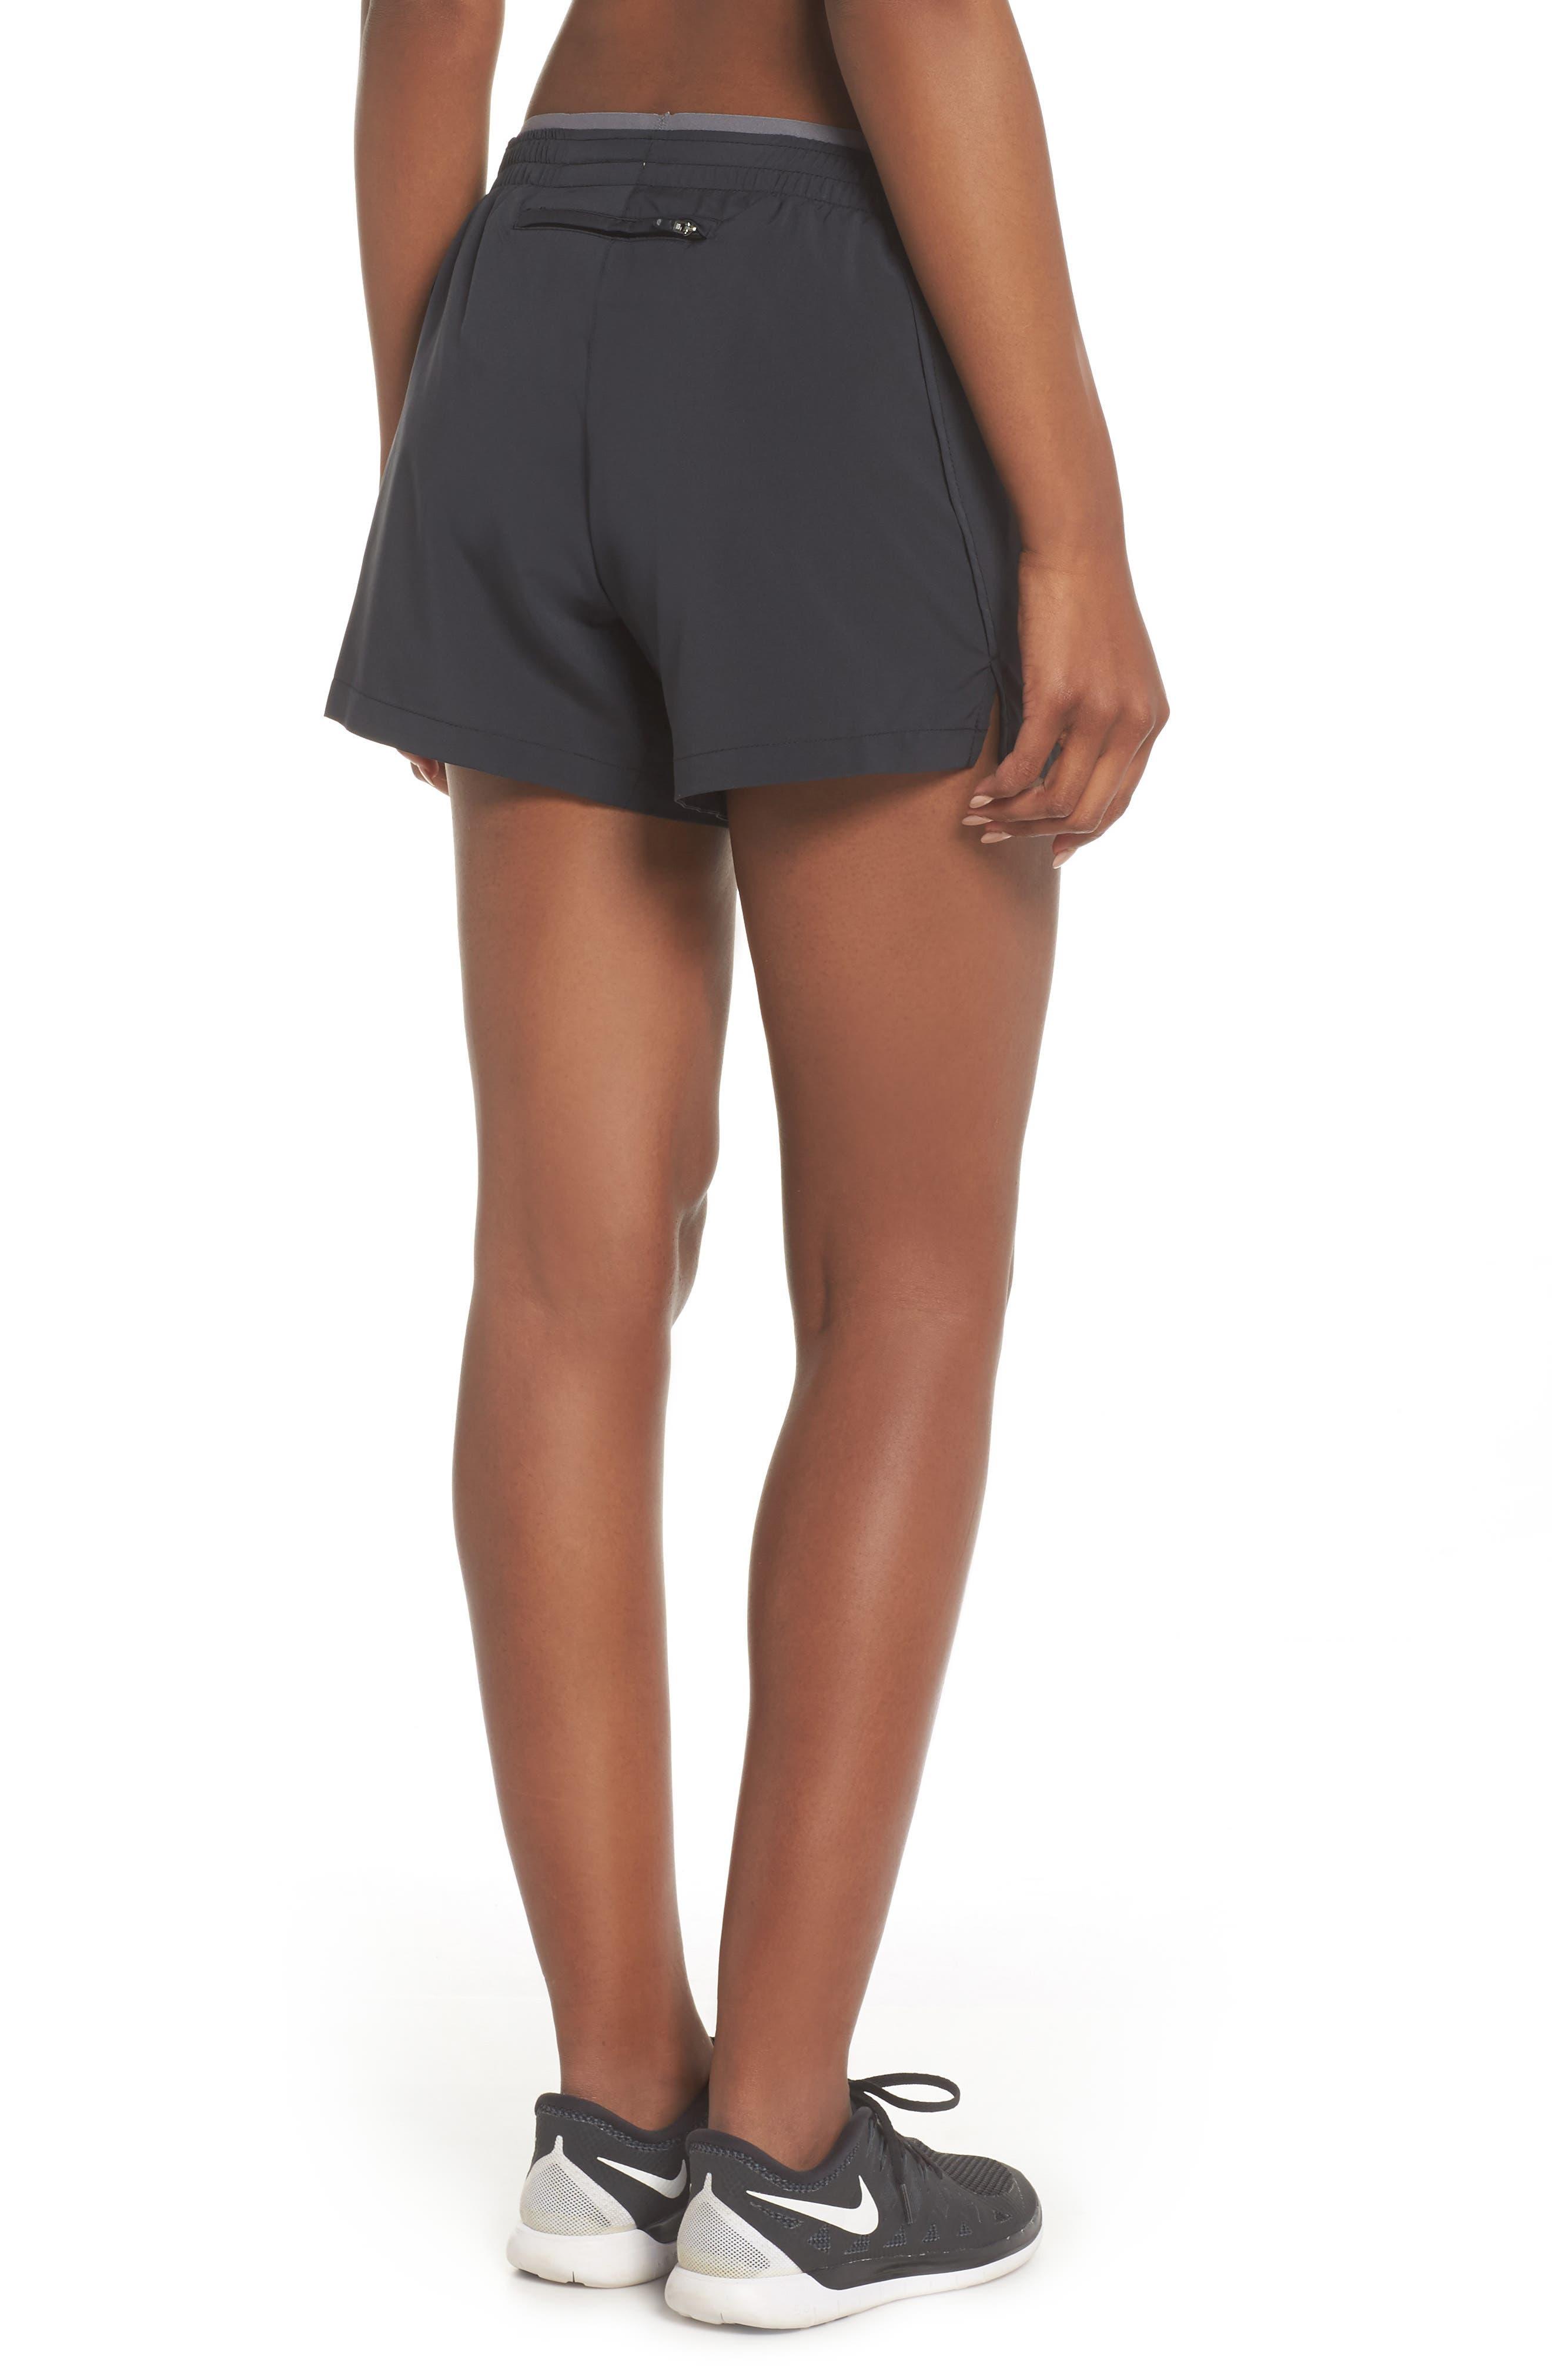 Flex 5-Inch Inseam Running Shorts,                             Alternate thumbnail 2, color,                             BLACK/ GUNSMOKE